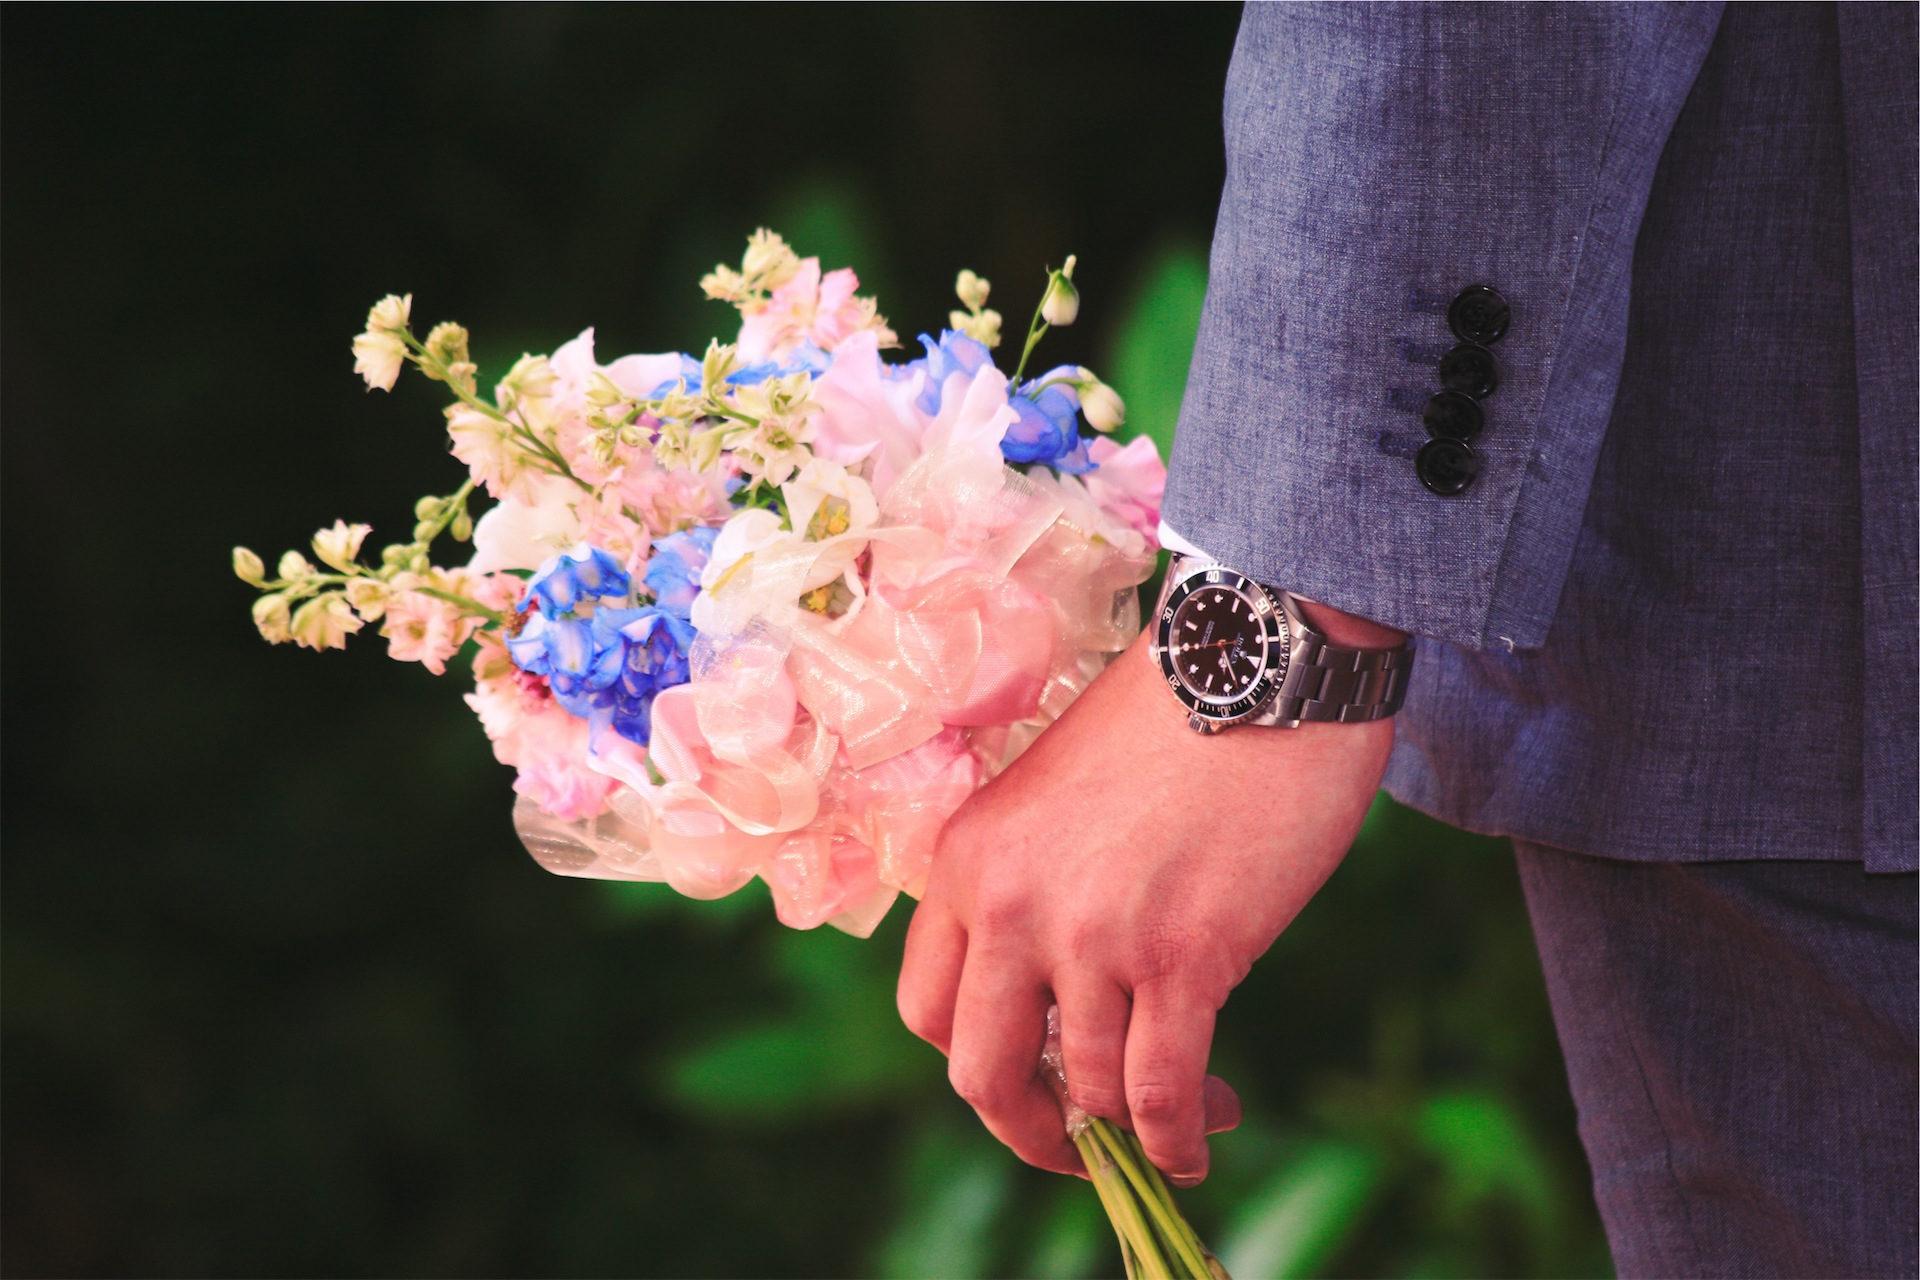 Blumenstrauß, Blumen, Uhr, Mann, Kostüm - Wallpaper HD - Prof.-falken.com